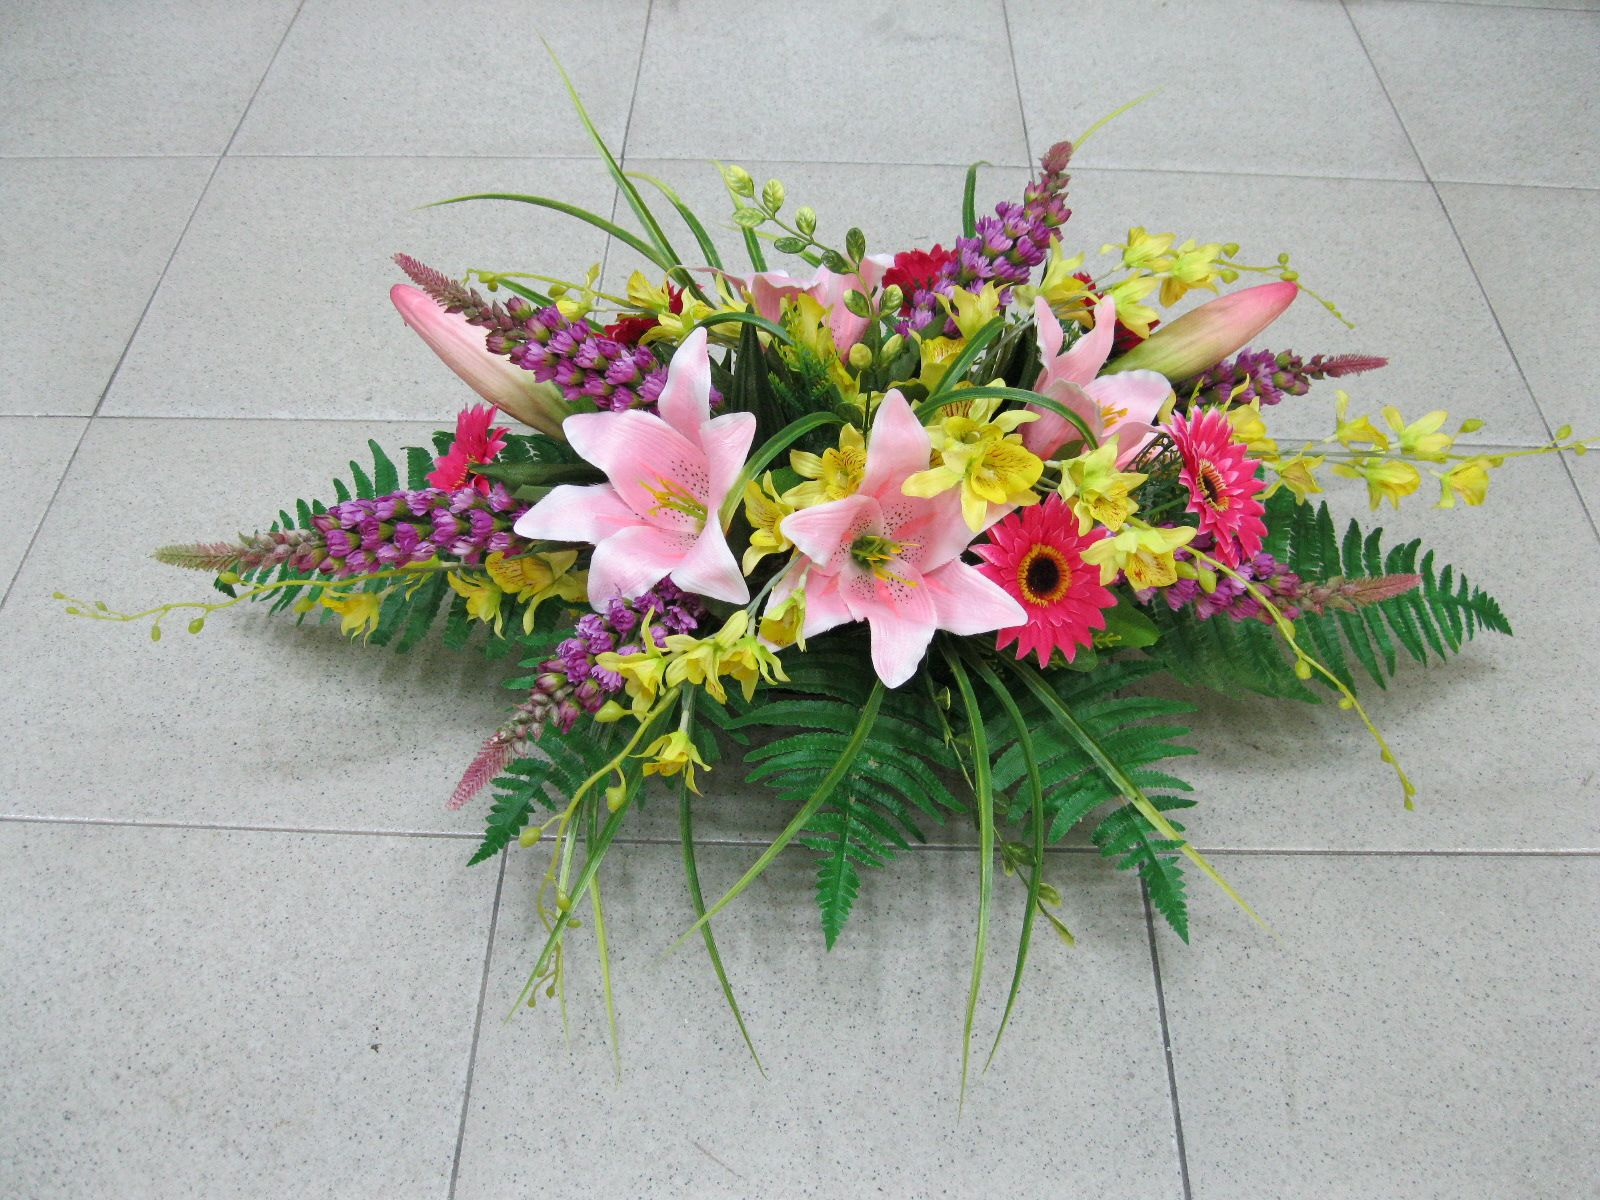 Floral Arrangements Hoi Kee Flower Shop Conference Table Floral